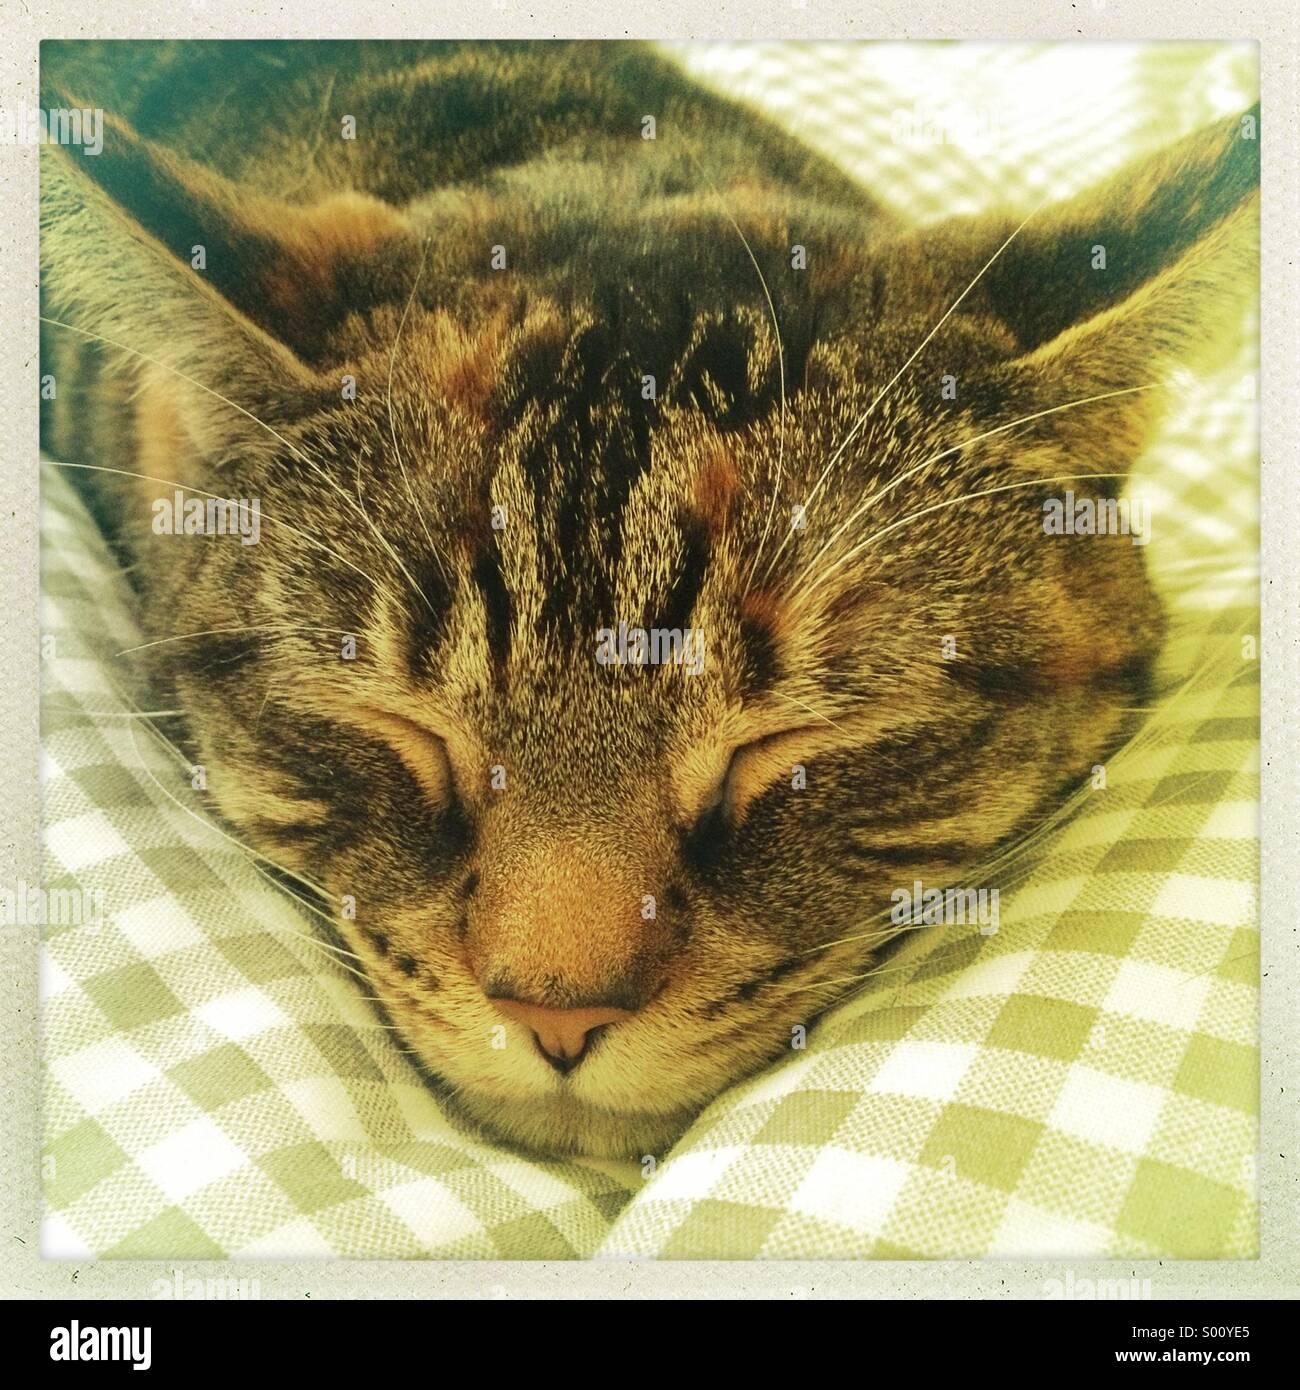 Sleeping cat Photo Stock